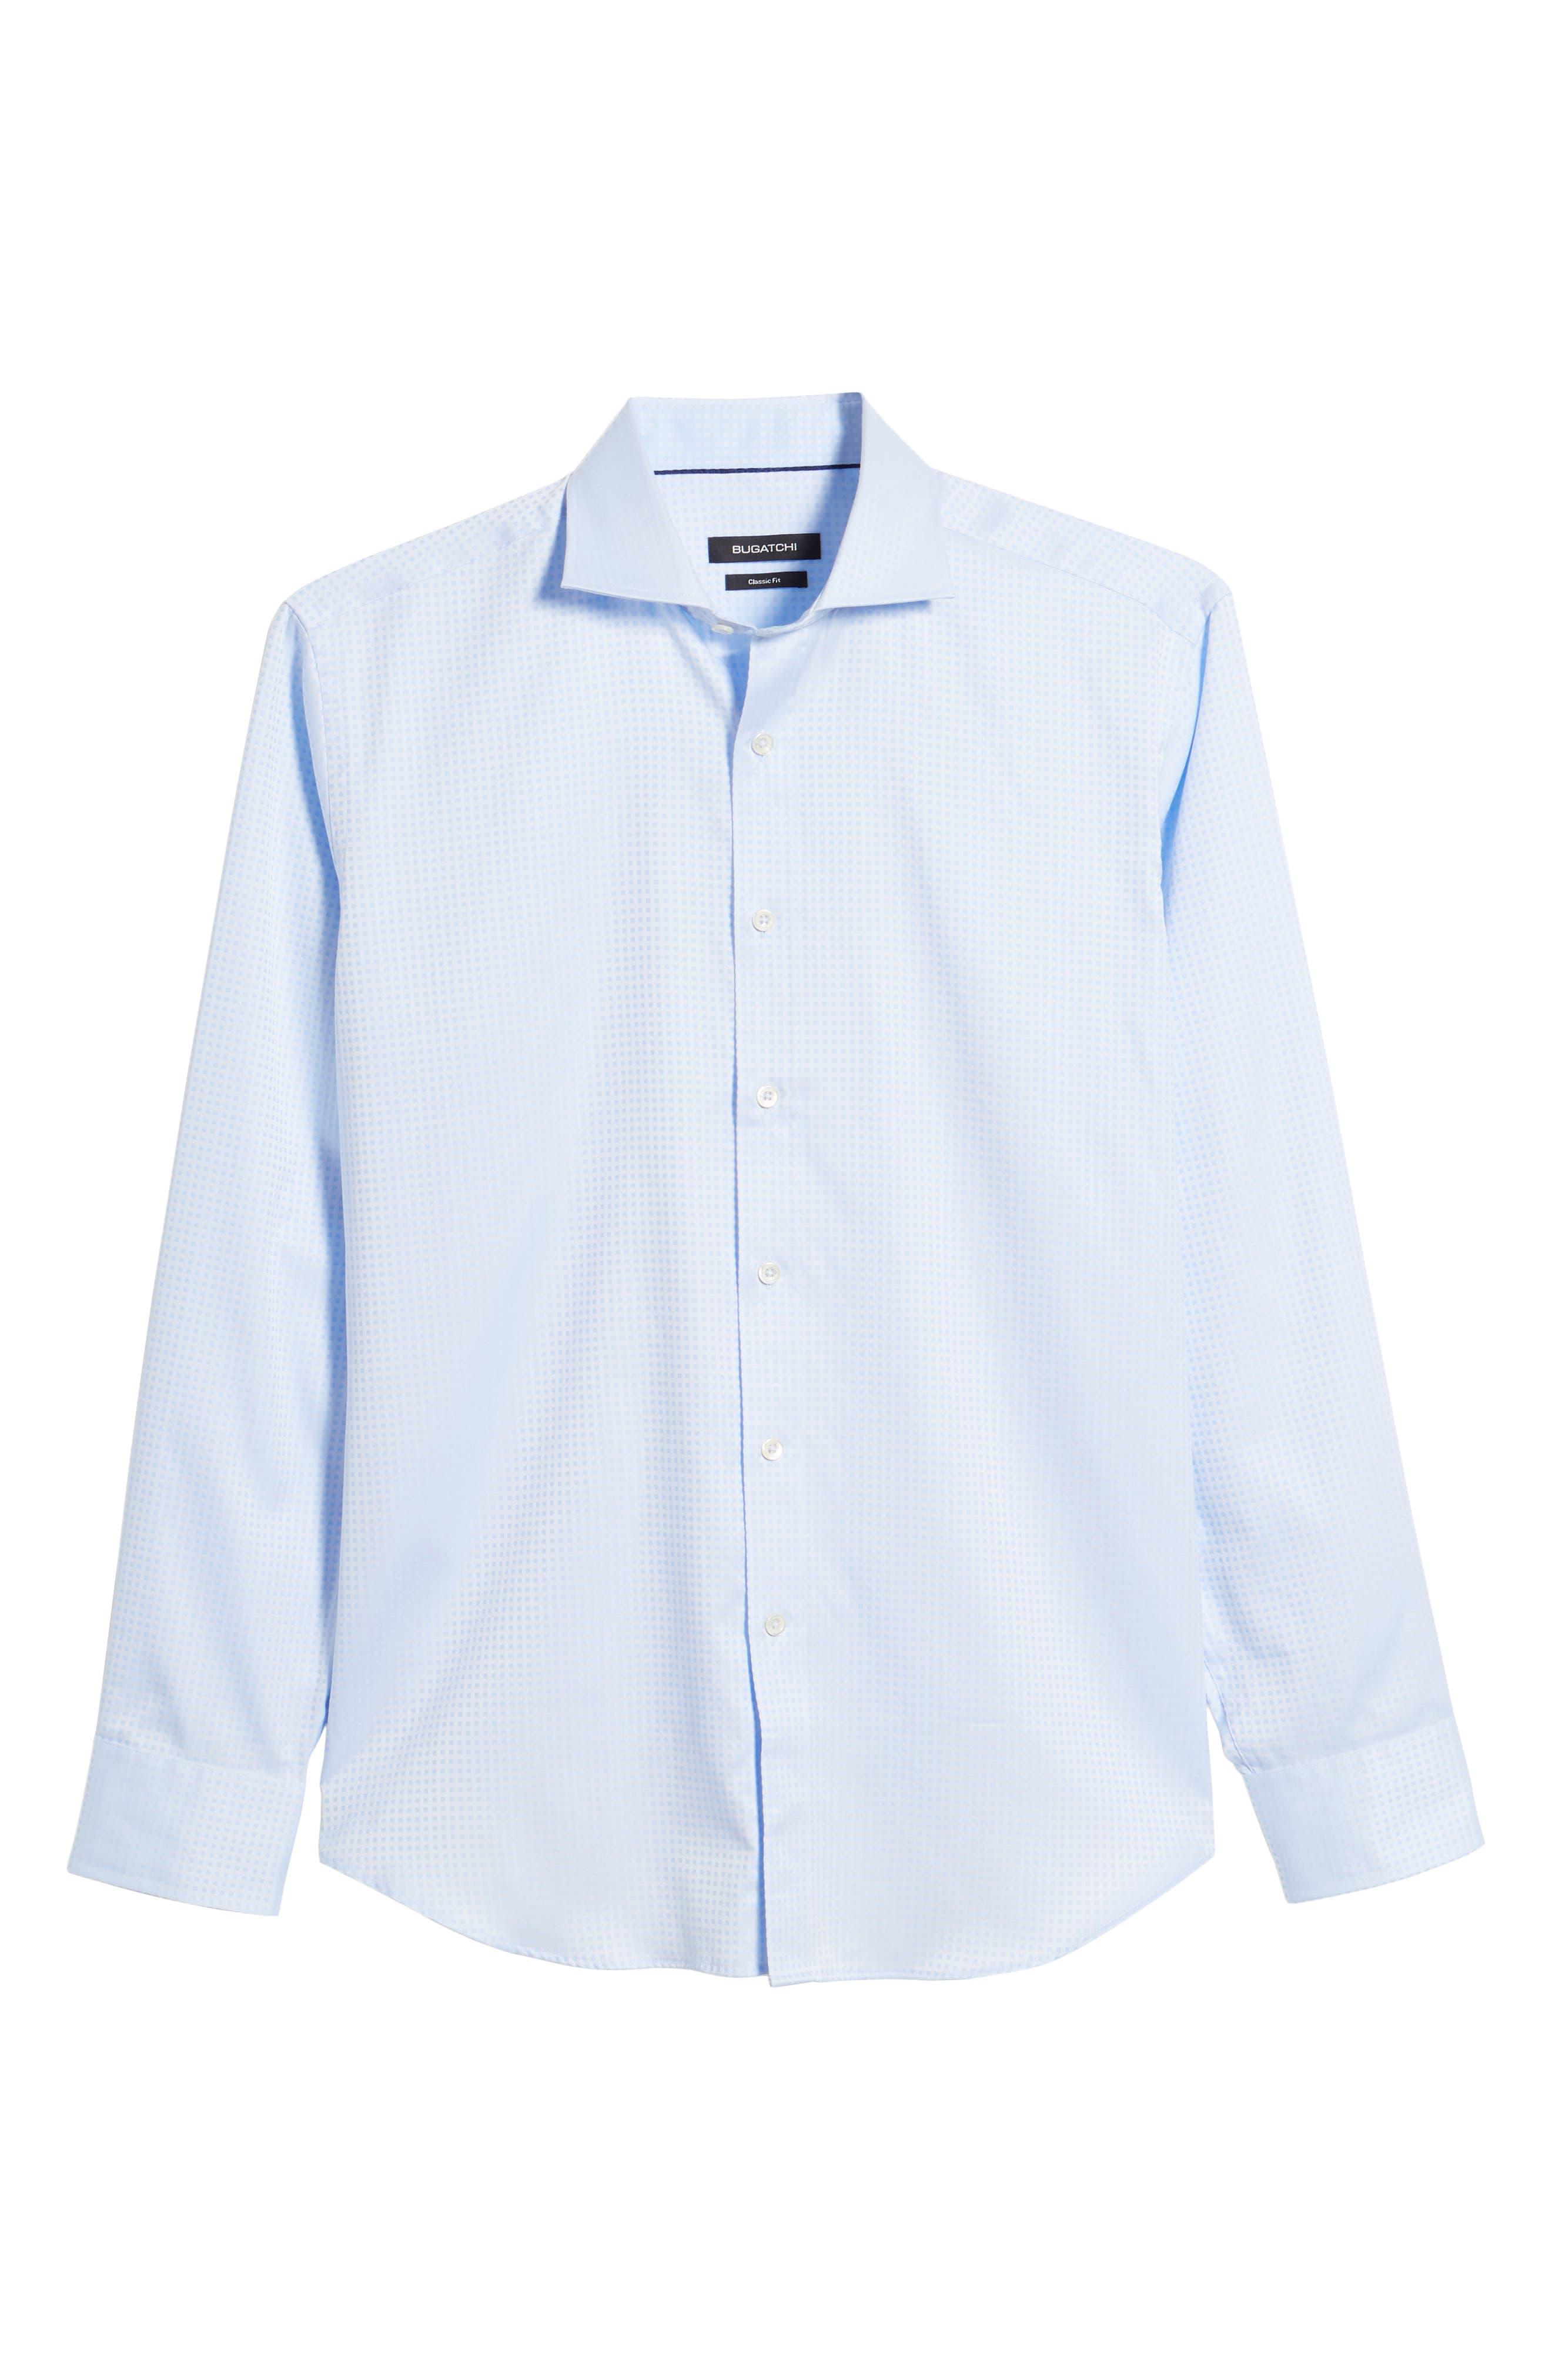 Classic Fit Pin Check Jacquard Sport Shirt,                             Alternate thumbnail 6, color,                             459